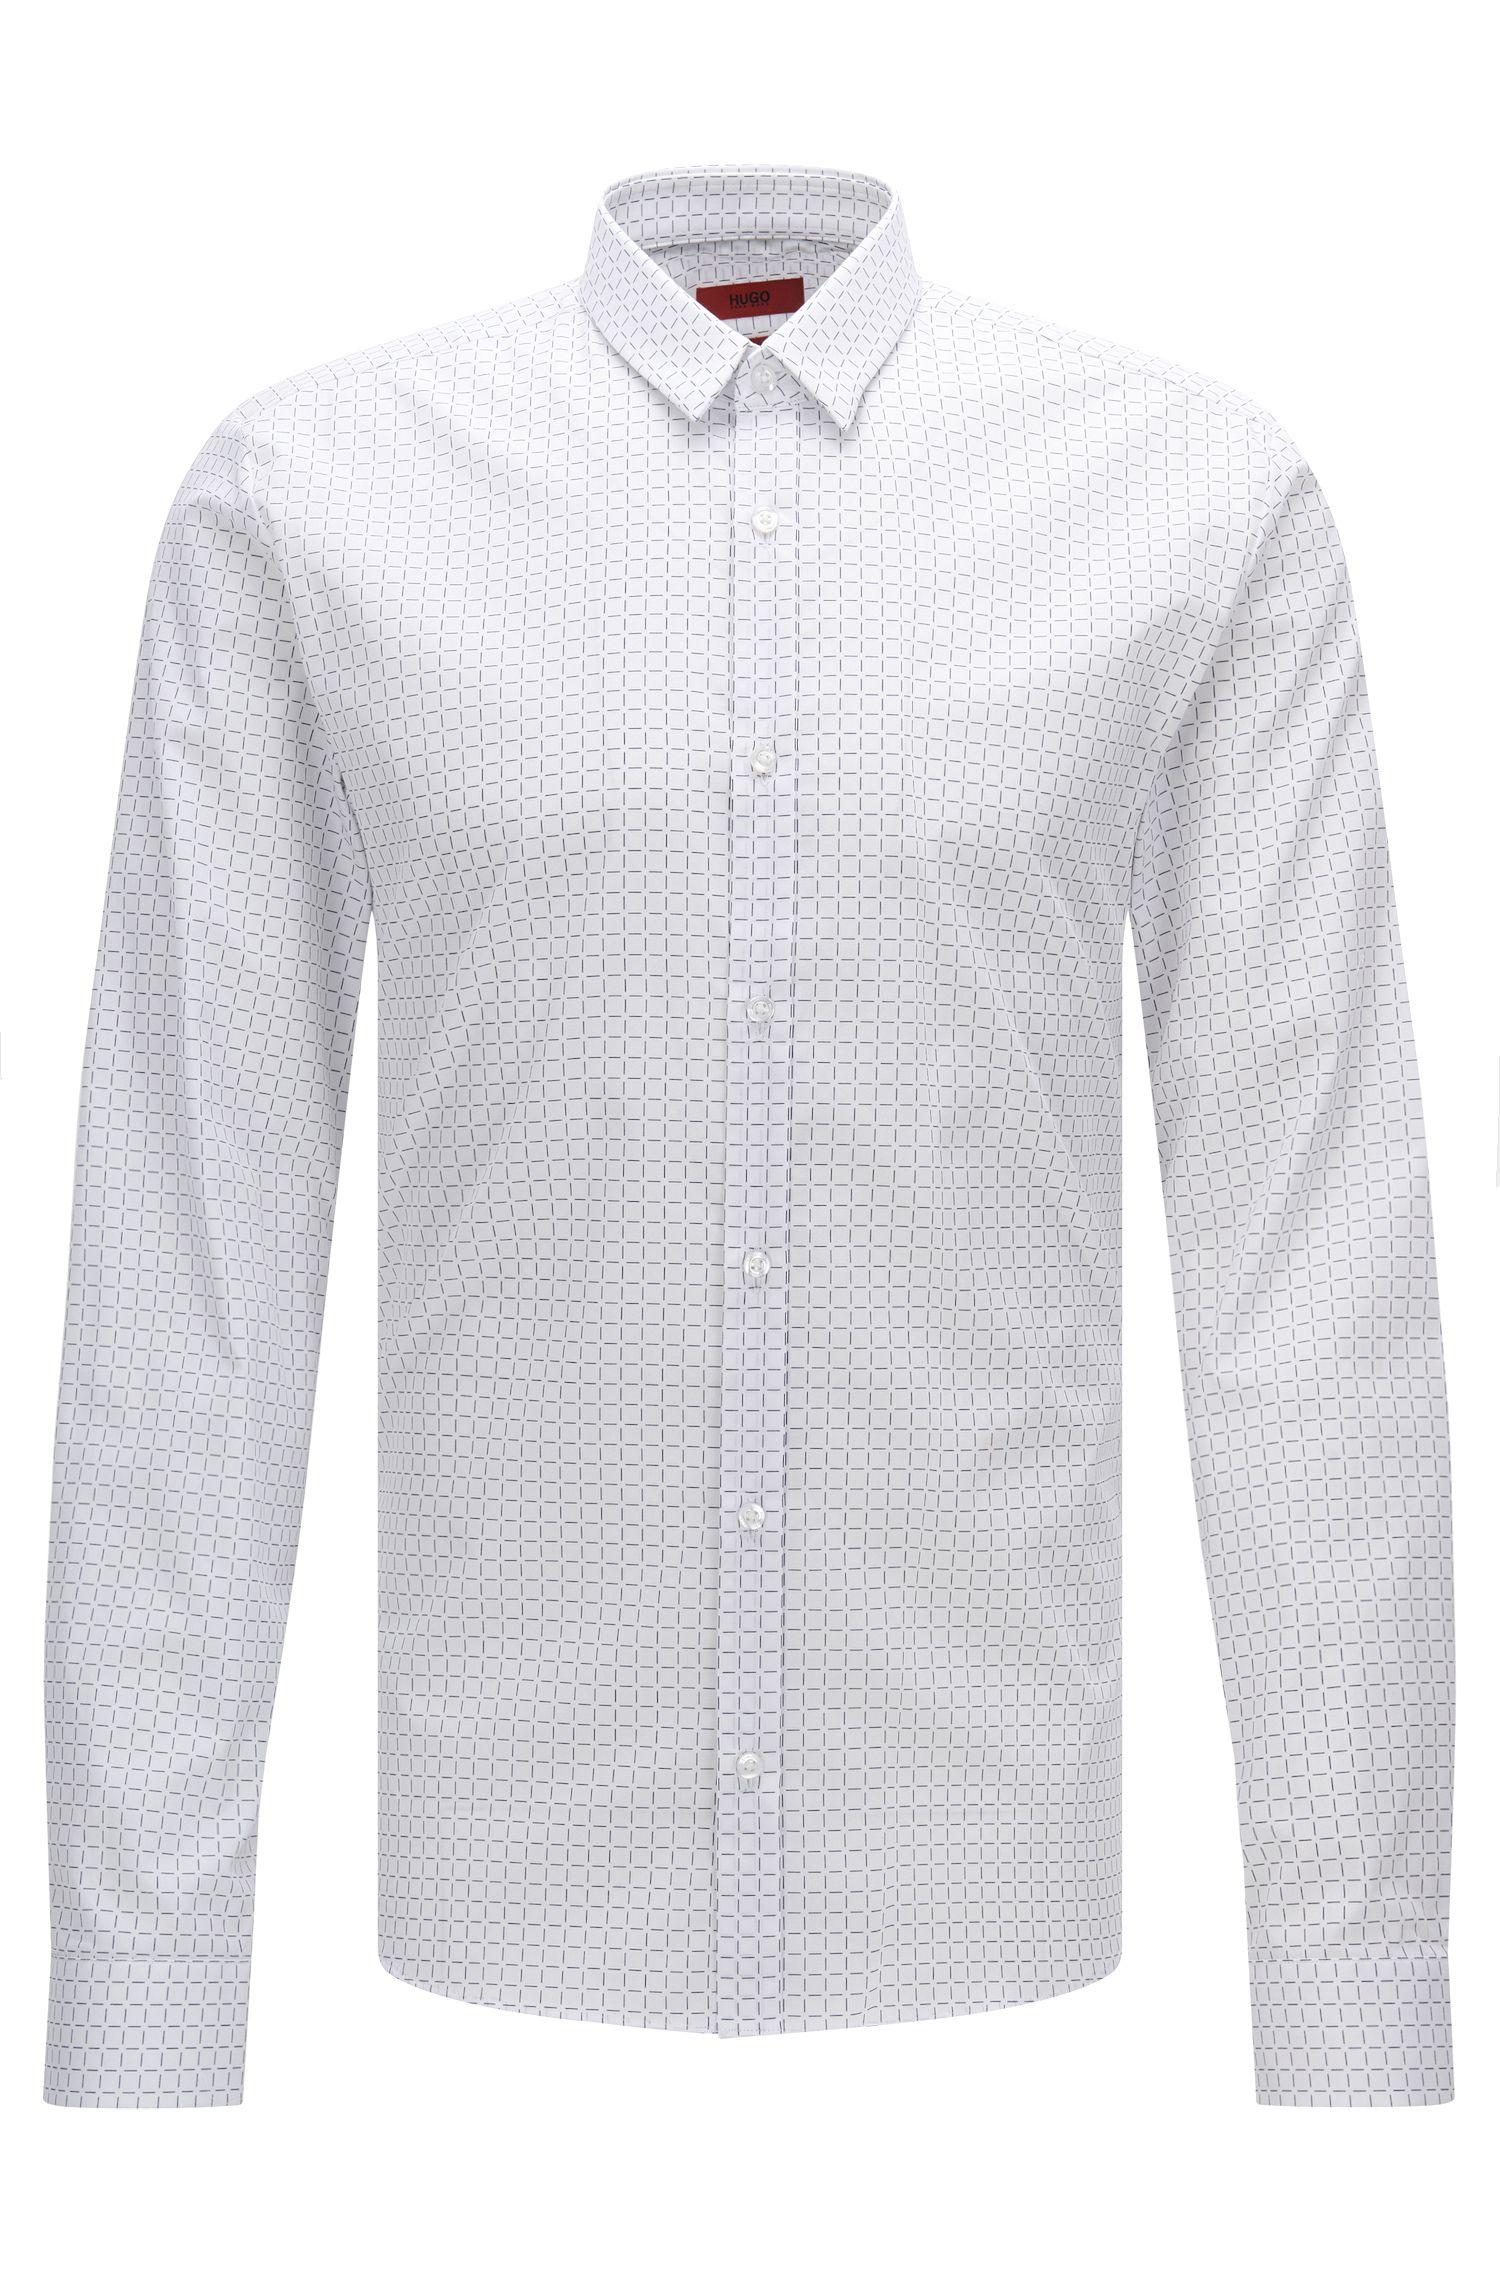 'Ero' | Slim Fit, Cotton Button Down Shirt